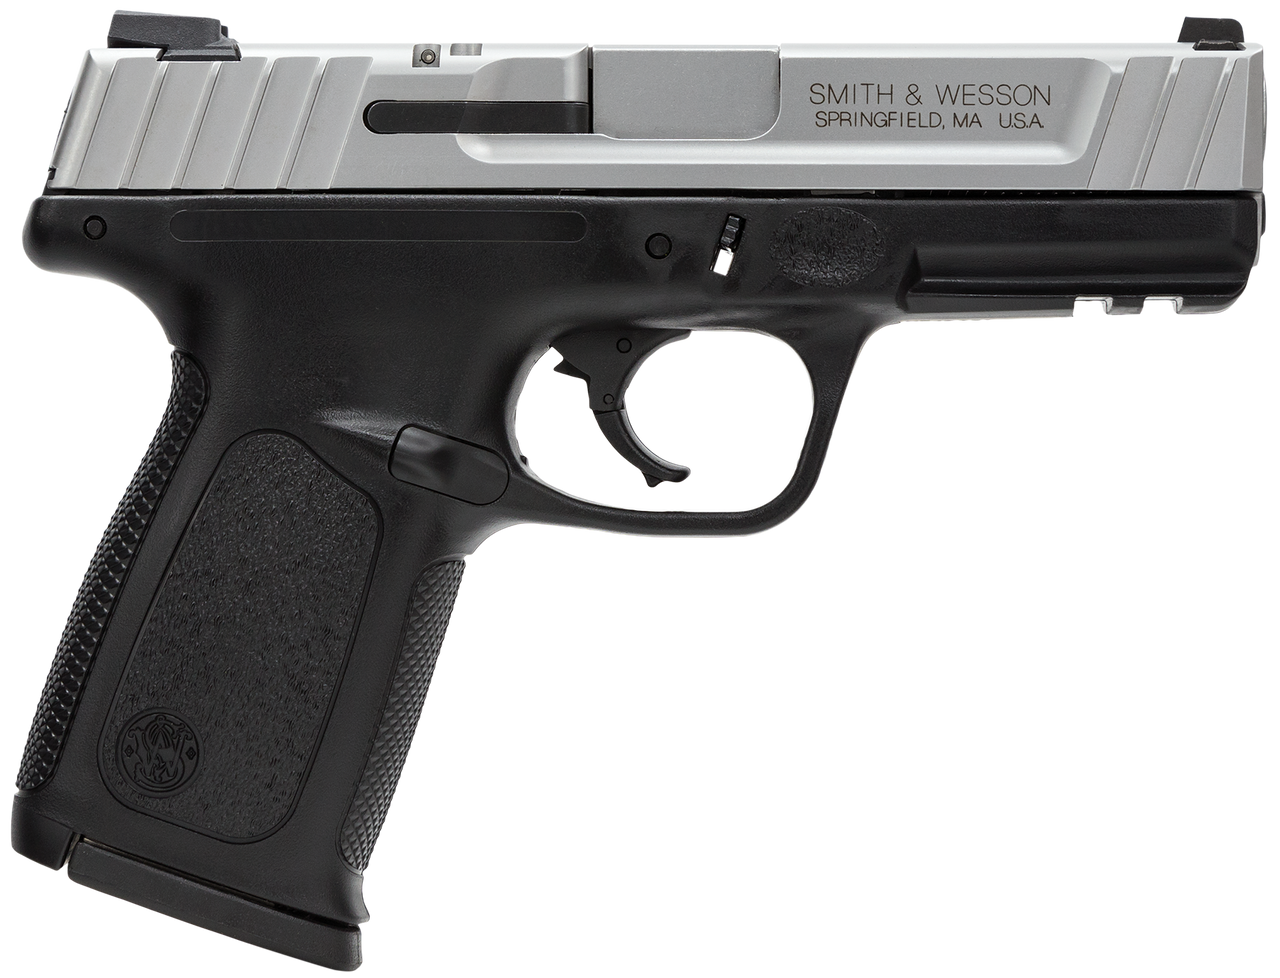 S&W SD9VE CALIFORNIA LEGAL - 9mm